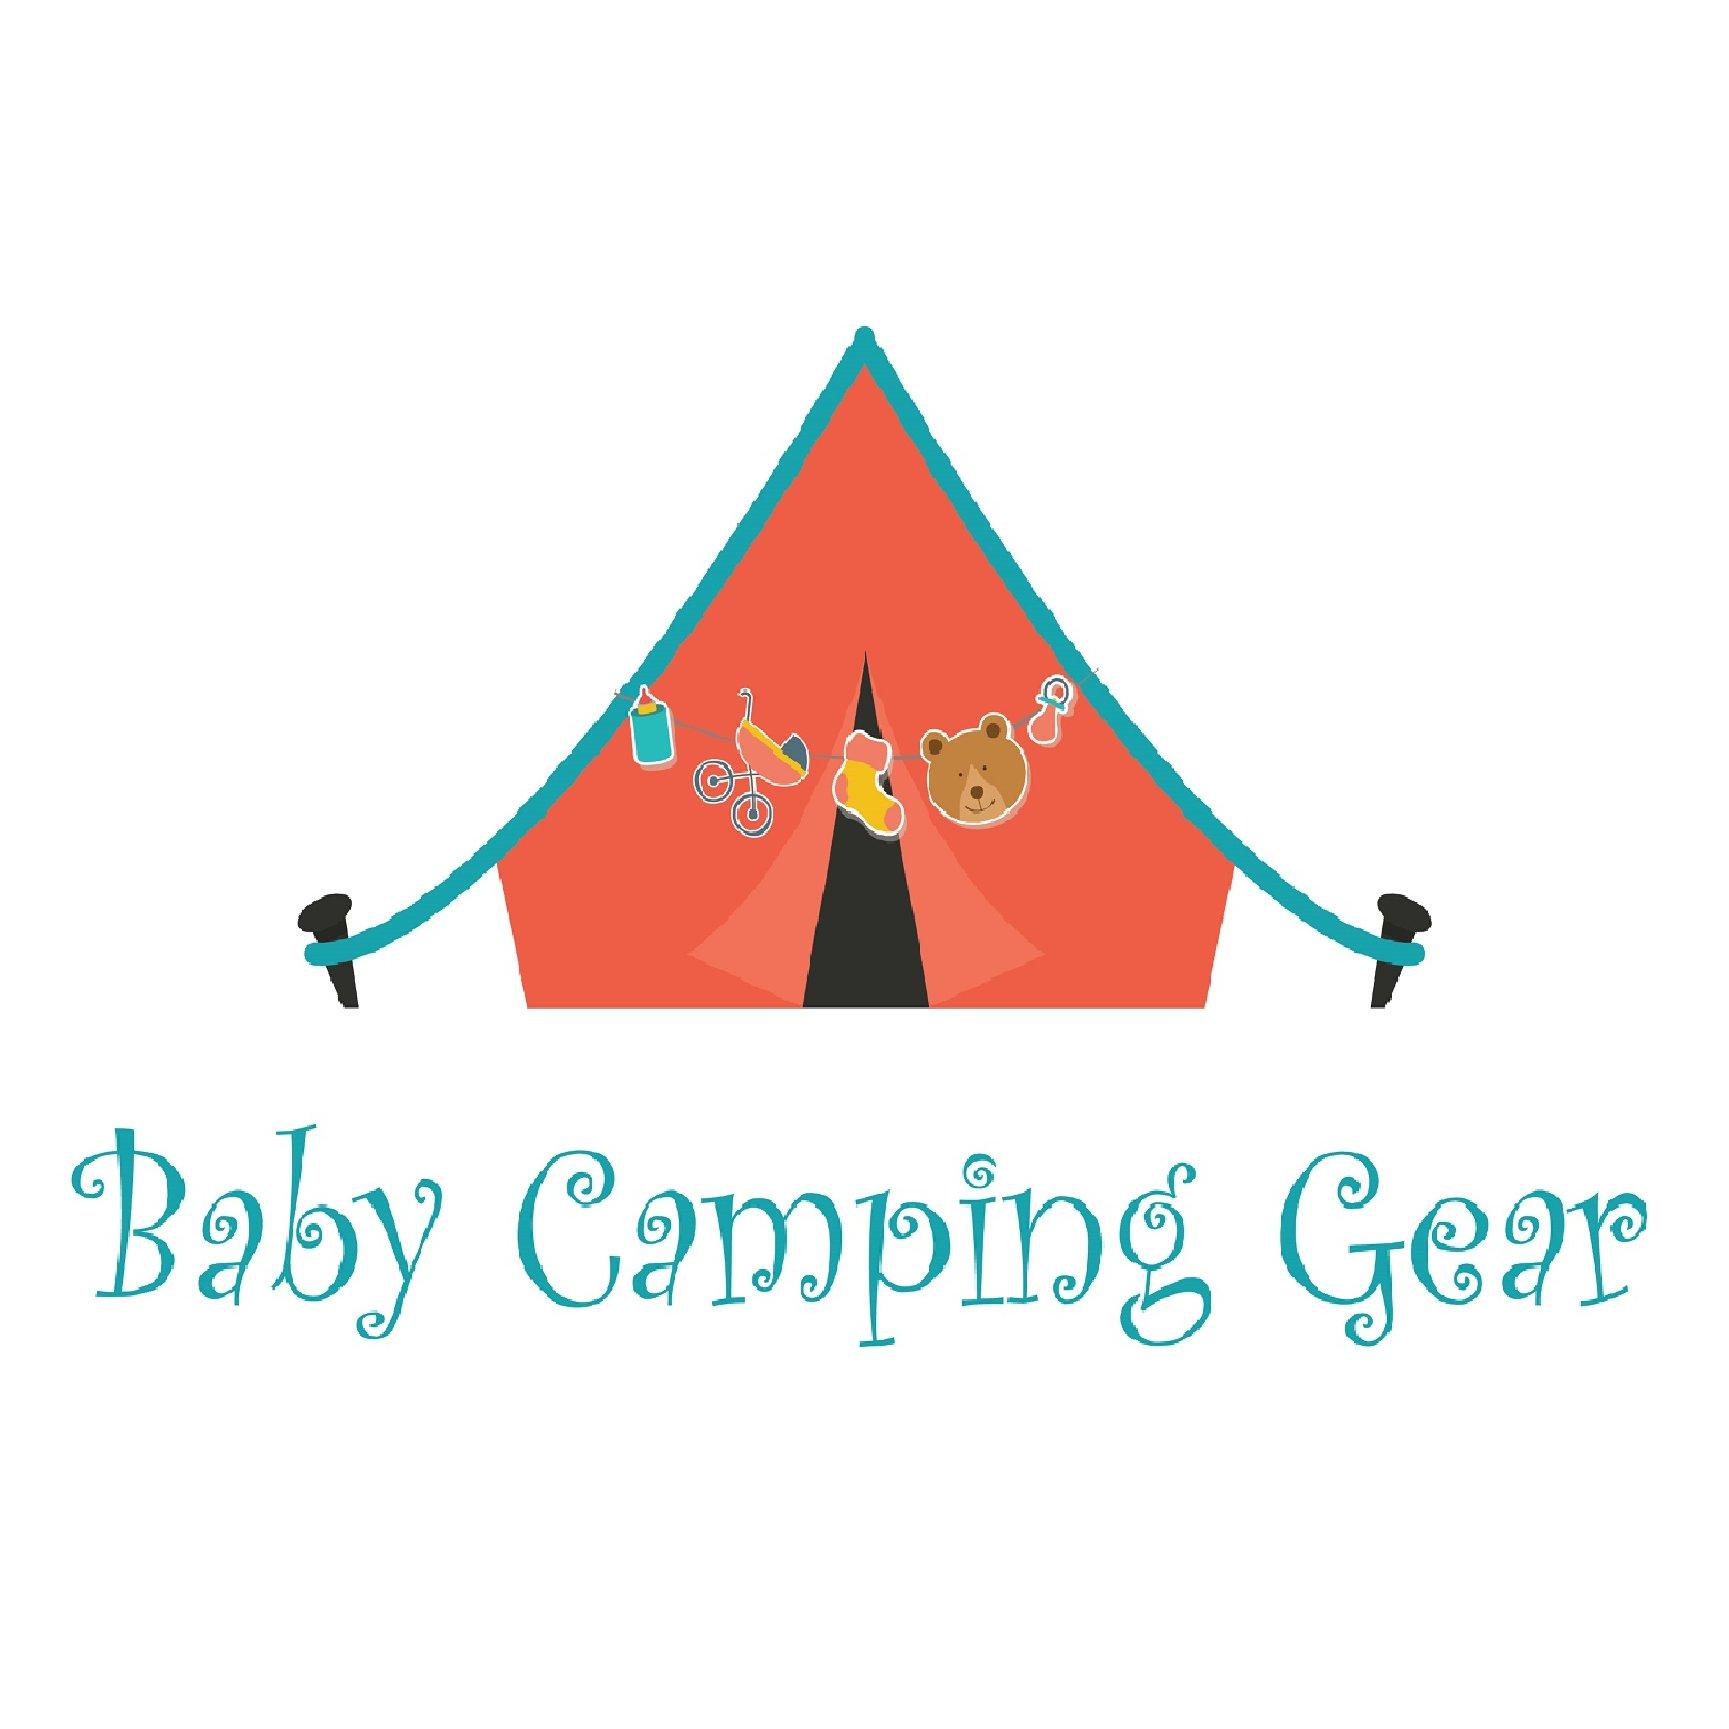 Baby Camping Gear babycampinggear